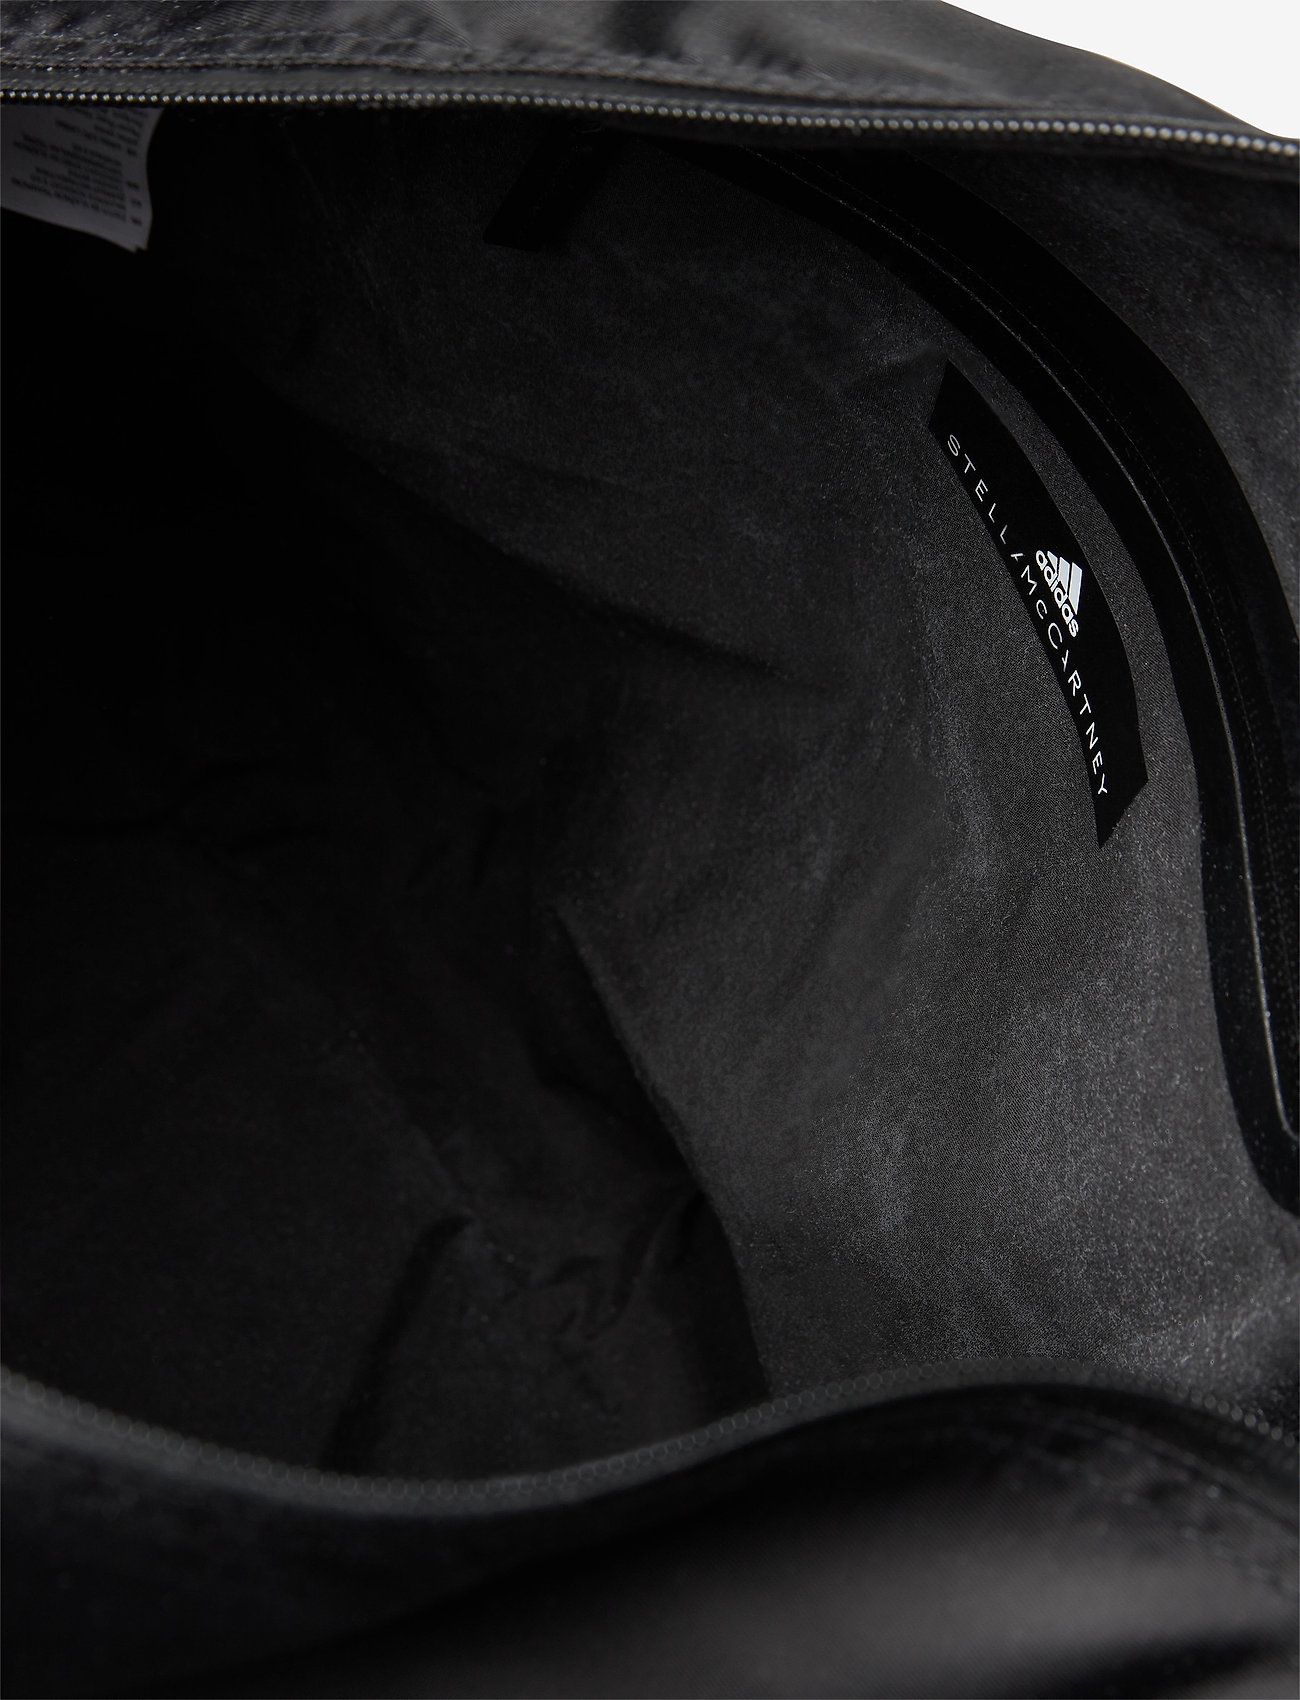 adidas by Stella McCartney - Squared Studio Bag W - gym bags - black/matblk/black - 4